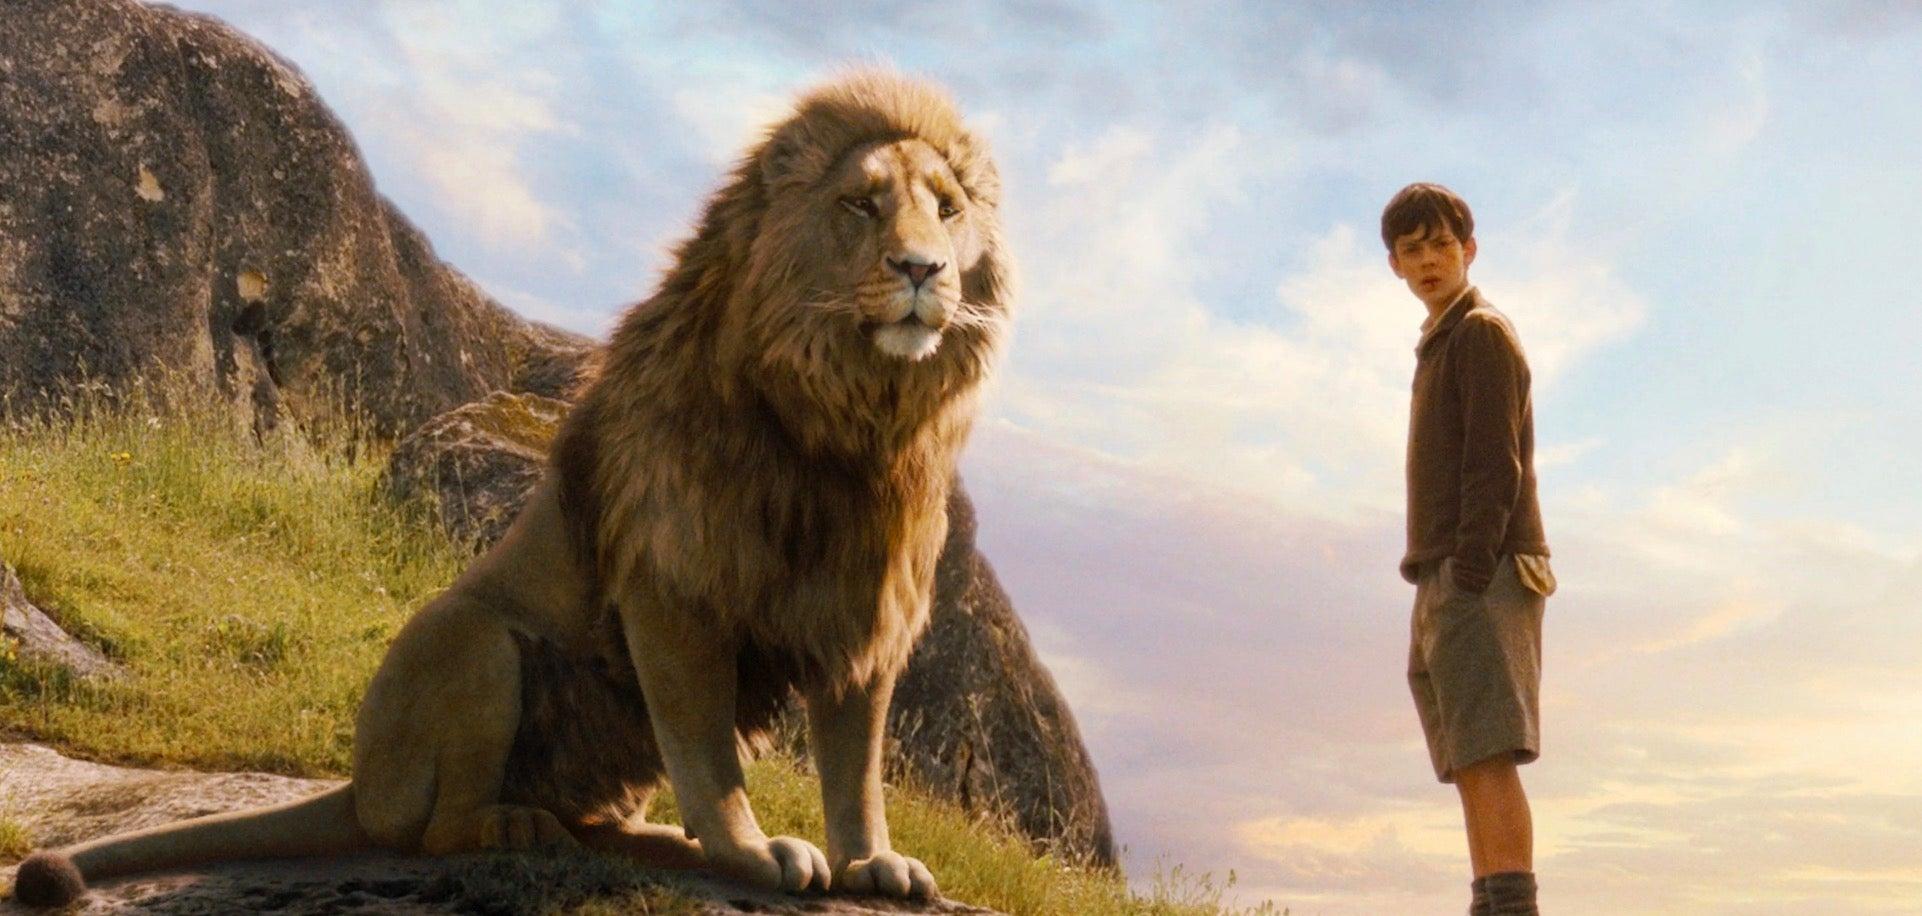 Marvel And Star Wars Vet Joe Johnston Will Direct The Next Chronicles Of Narnia Movie